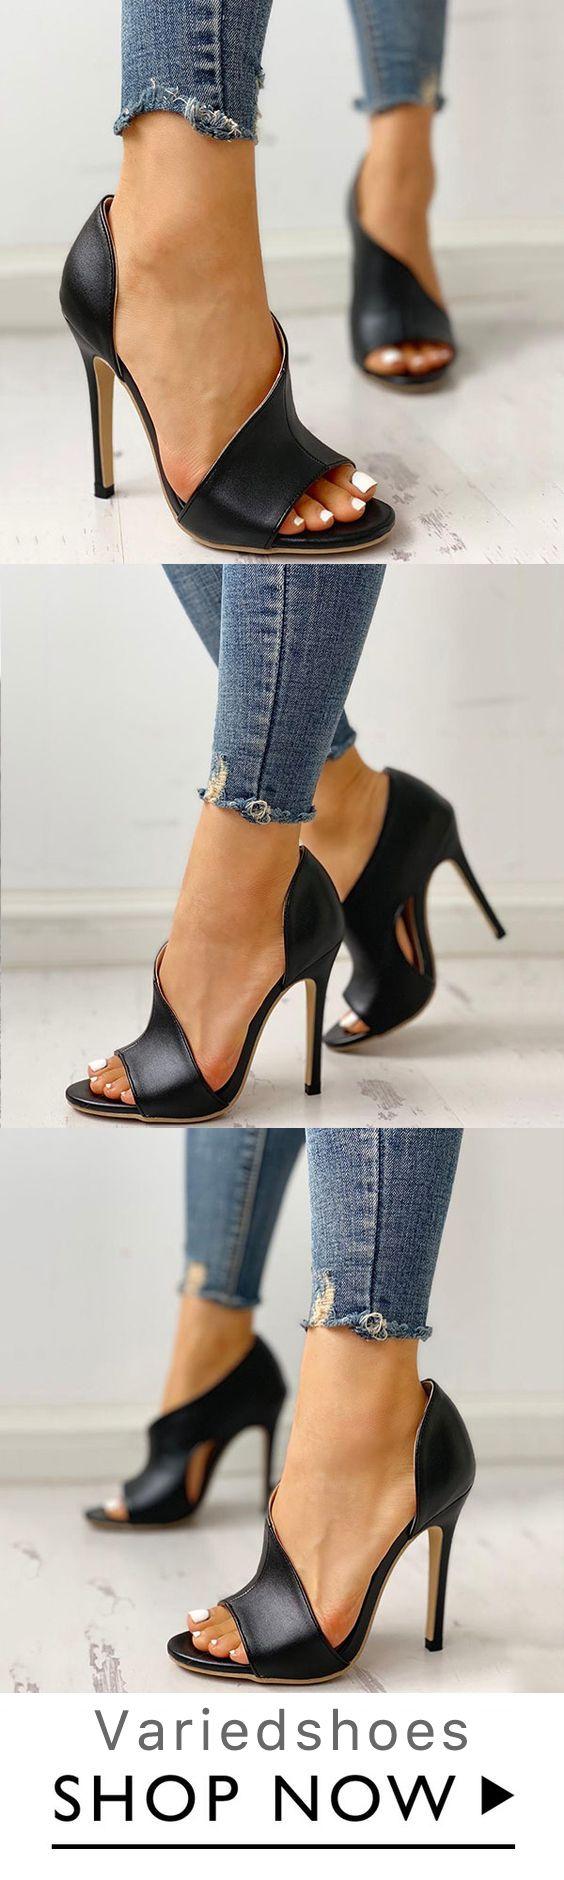 Cutout Peep Toe Thin Heeled Heels is part of Shoes -  Heels Upper Material Faux Leather Toe Peep Toe Closure Type Buckle straps Heels High Heel (10cm)